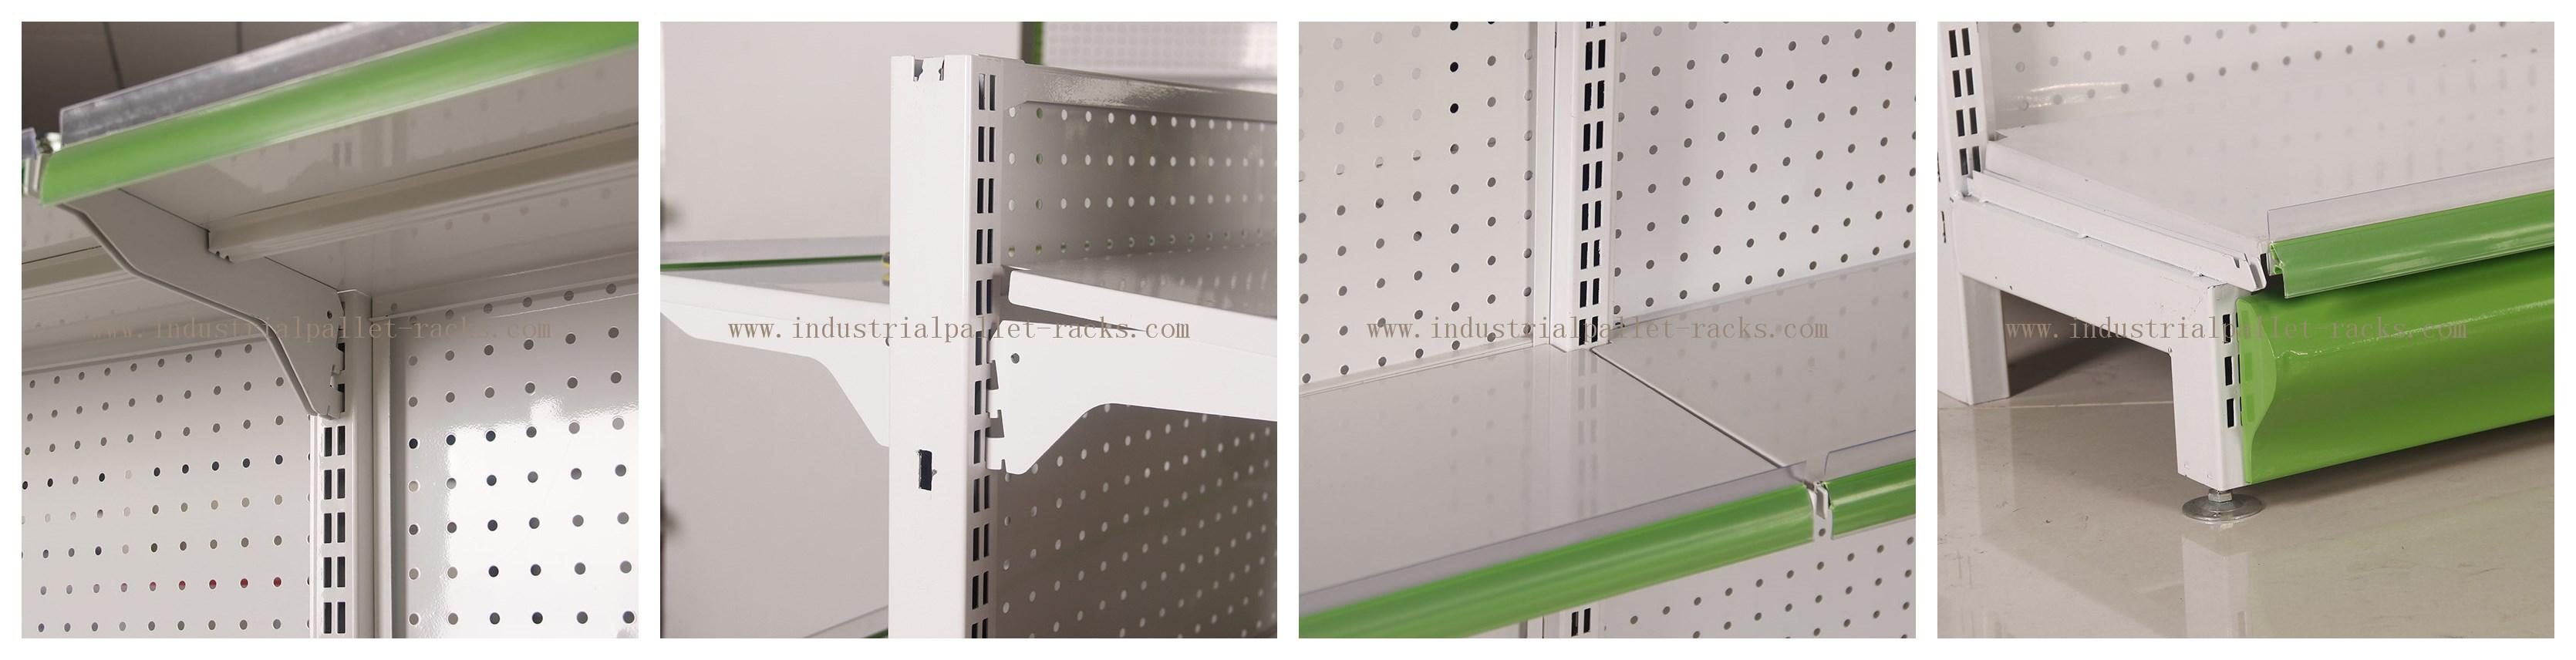 Gondola Shelving Multi Level Display Rack For Versatile